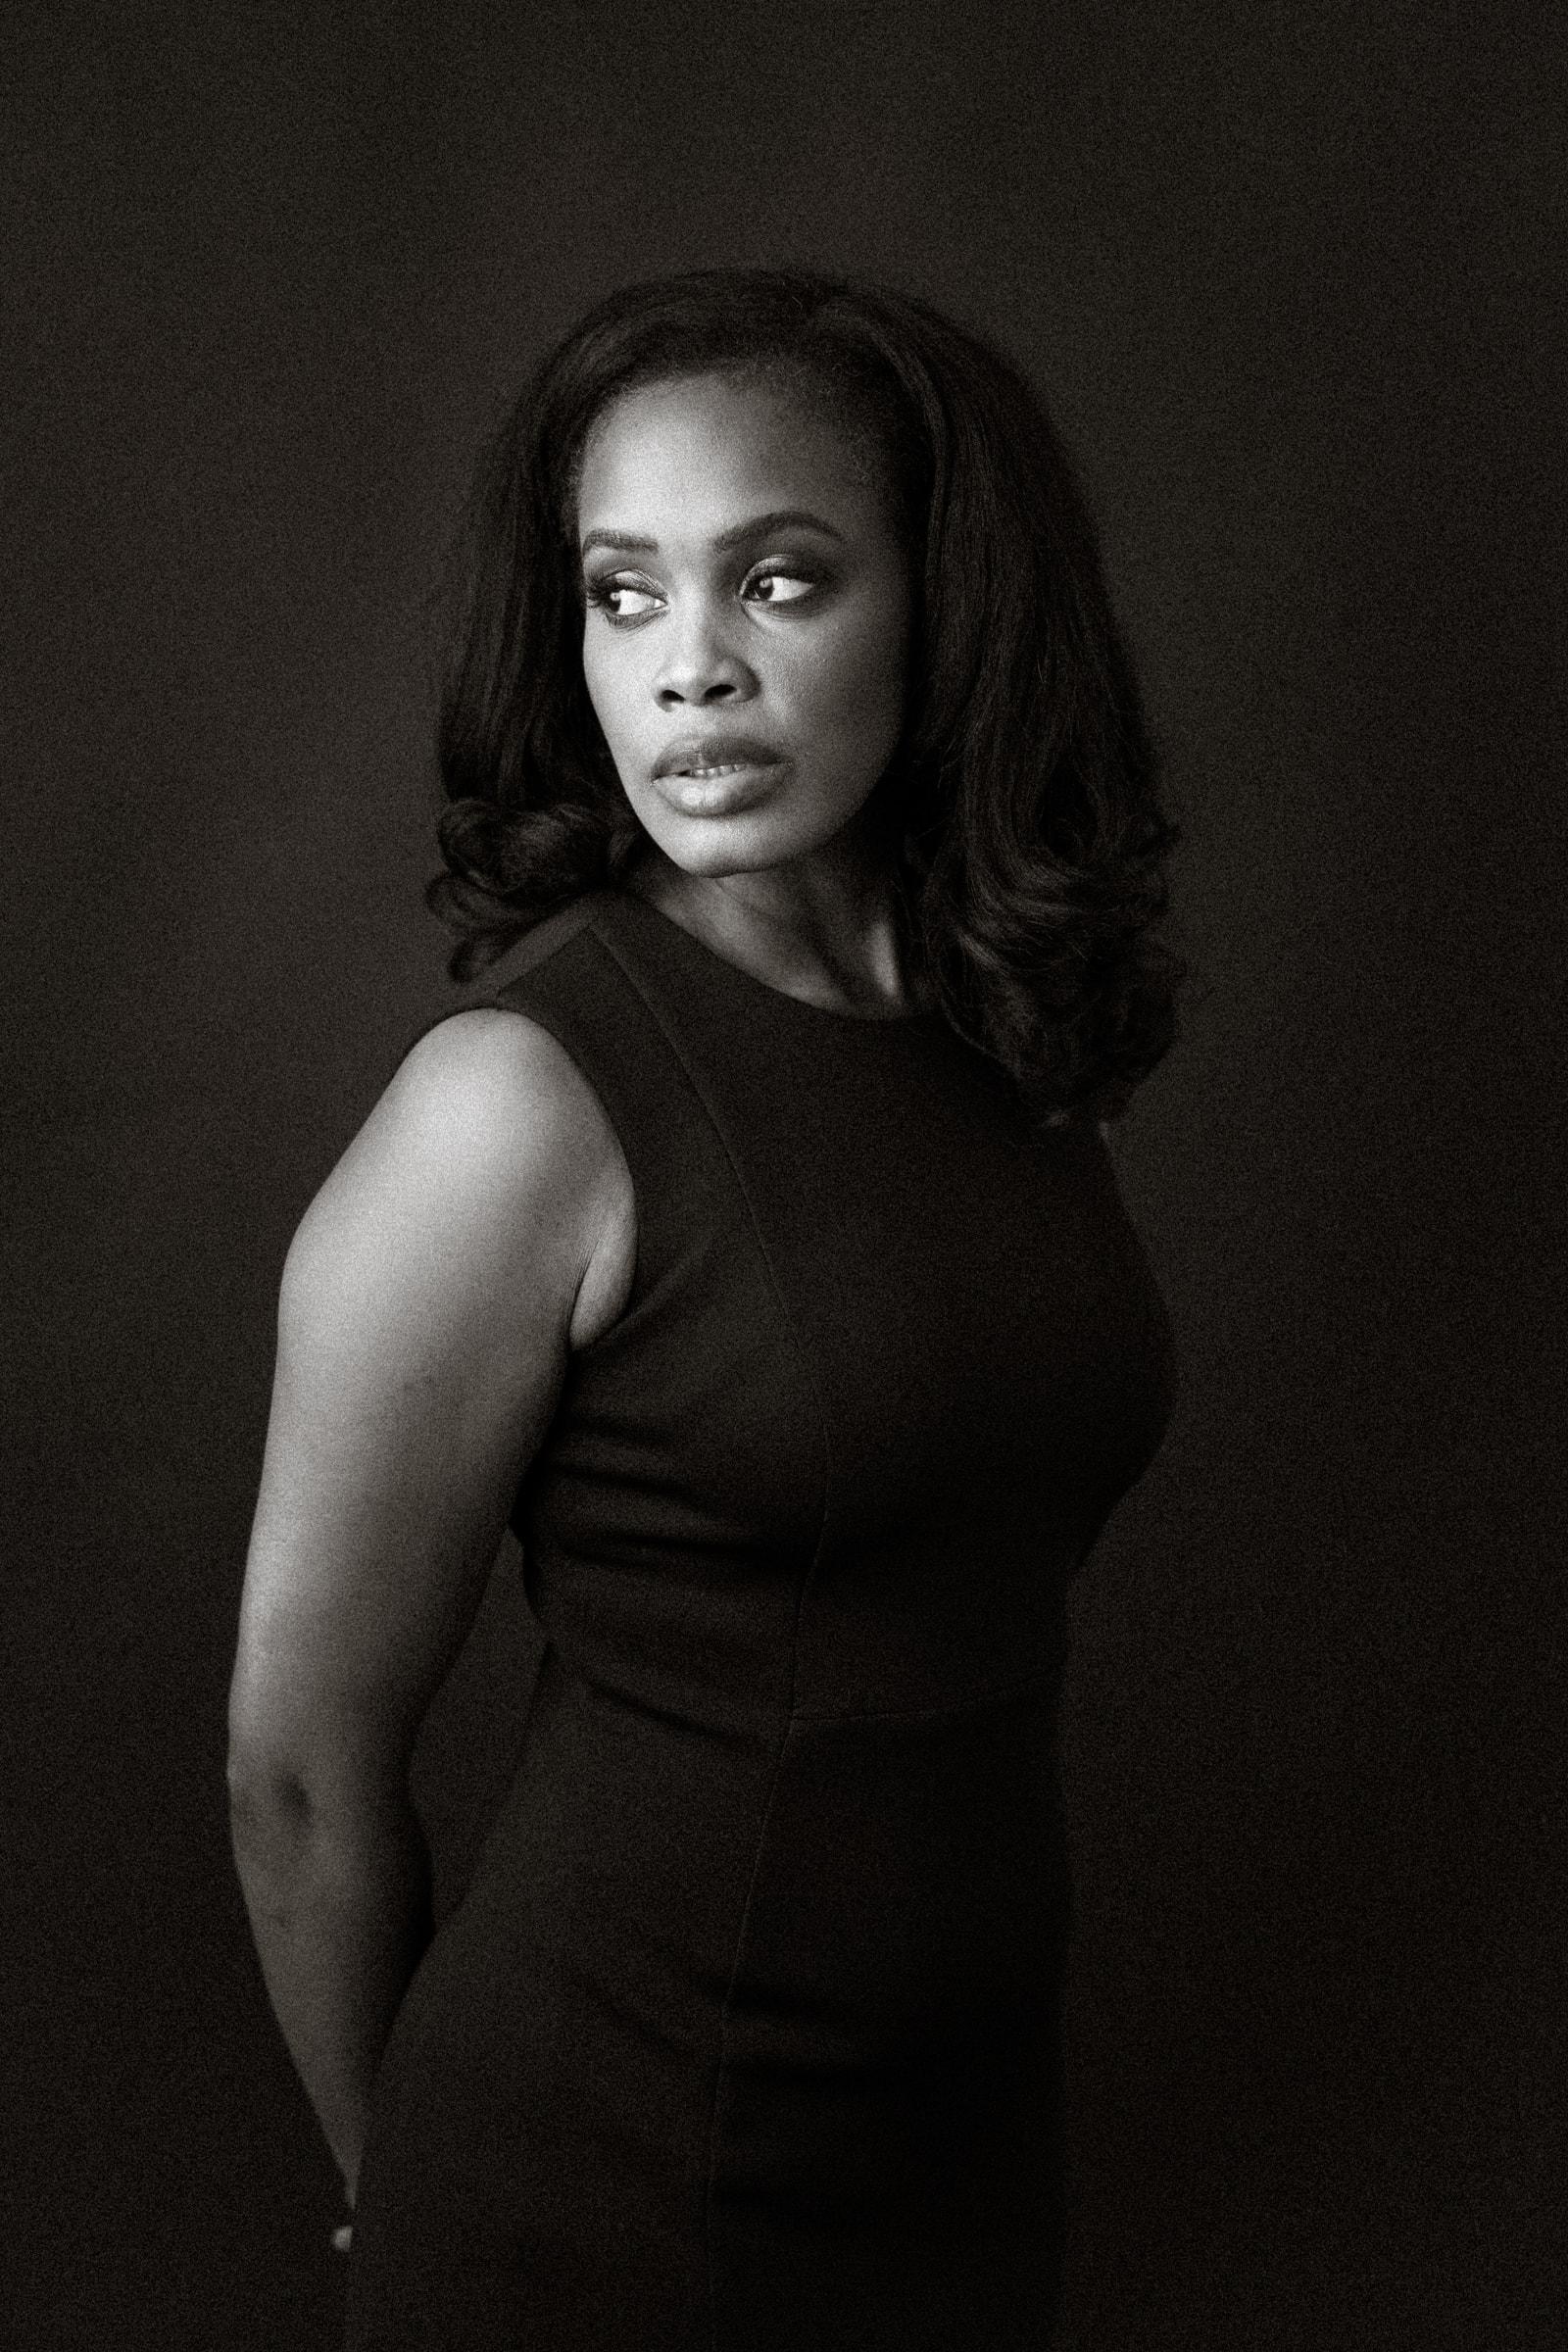 raleigh headshot photographer - Stephanie's portrait in B&W